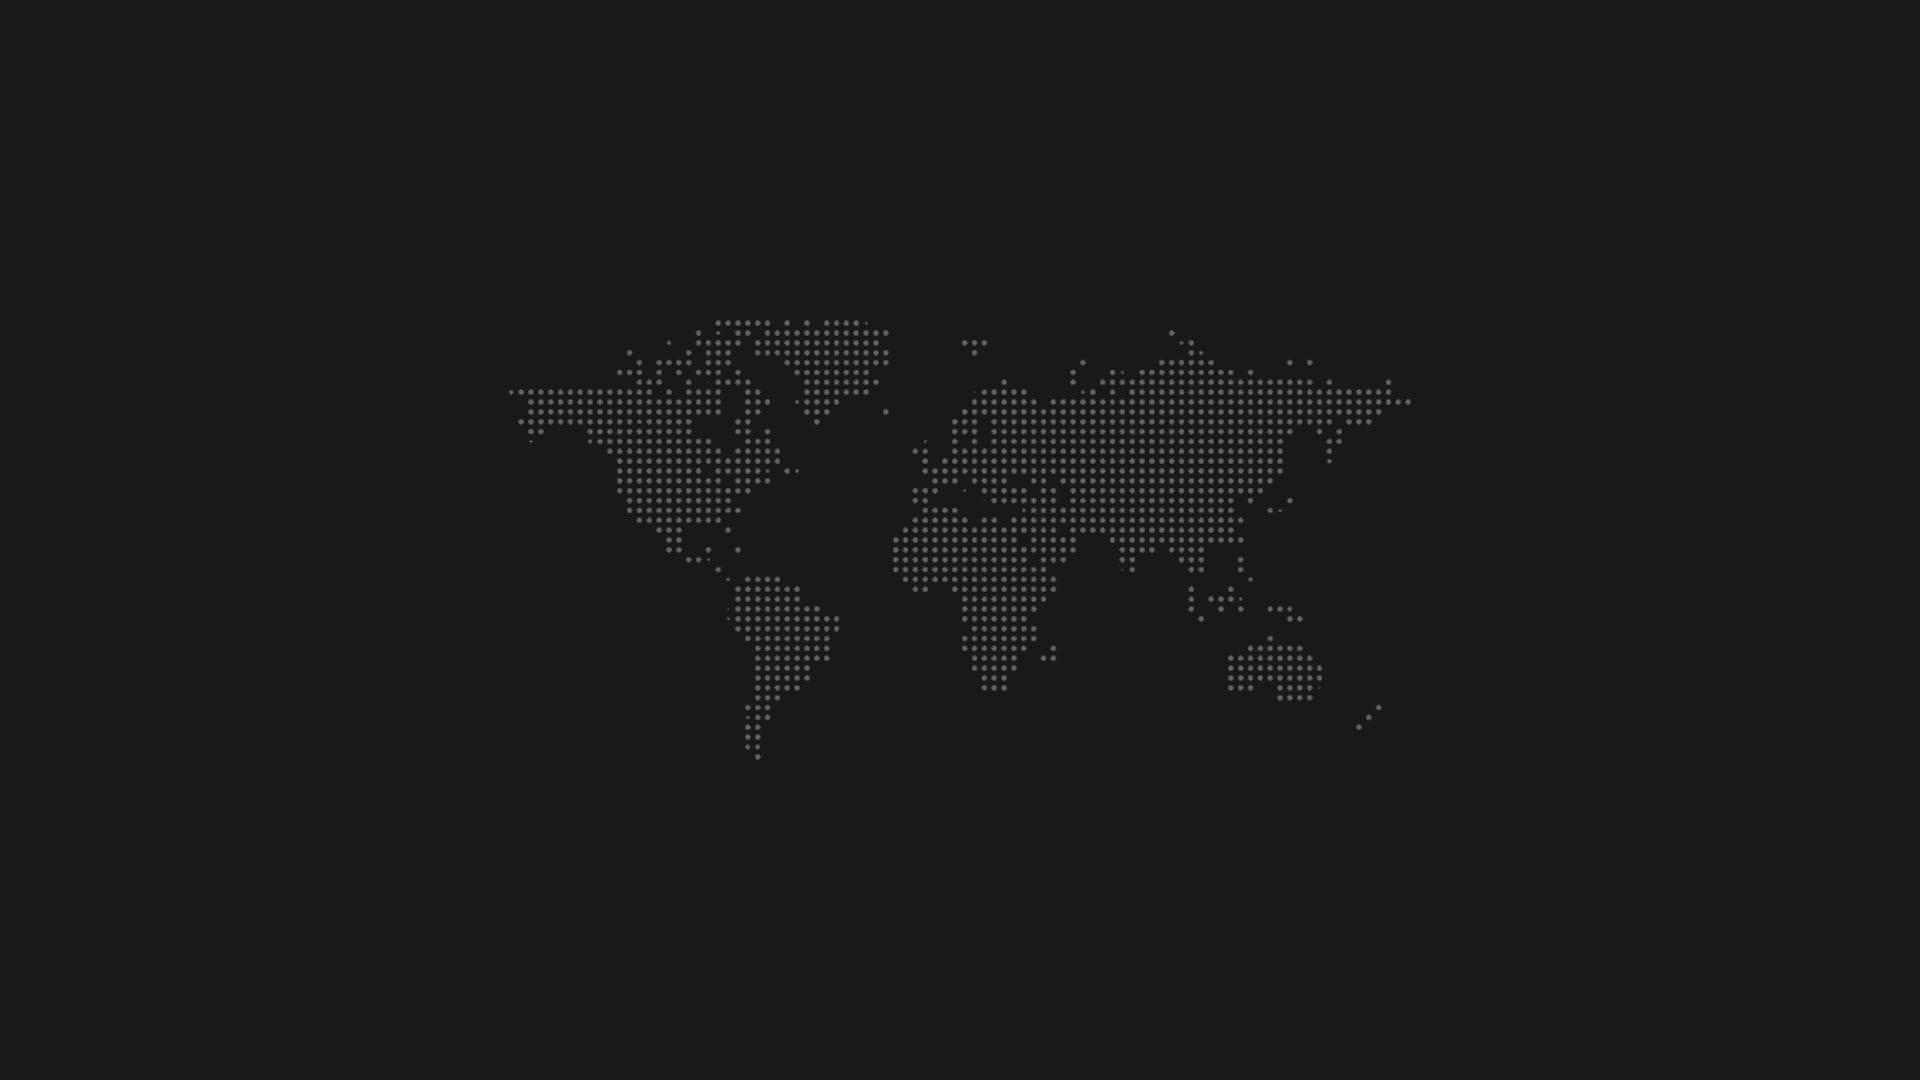 Super mario world map wallpaper 56 images 1920x1080 super mario bros hd desktop wallpaper fullscreen dual monitor 12801024 mario bros download 1920x1080 world map gumiabroncs Gallery